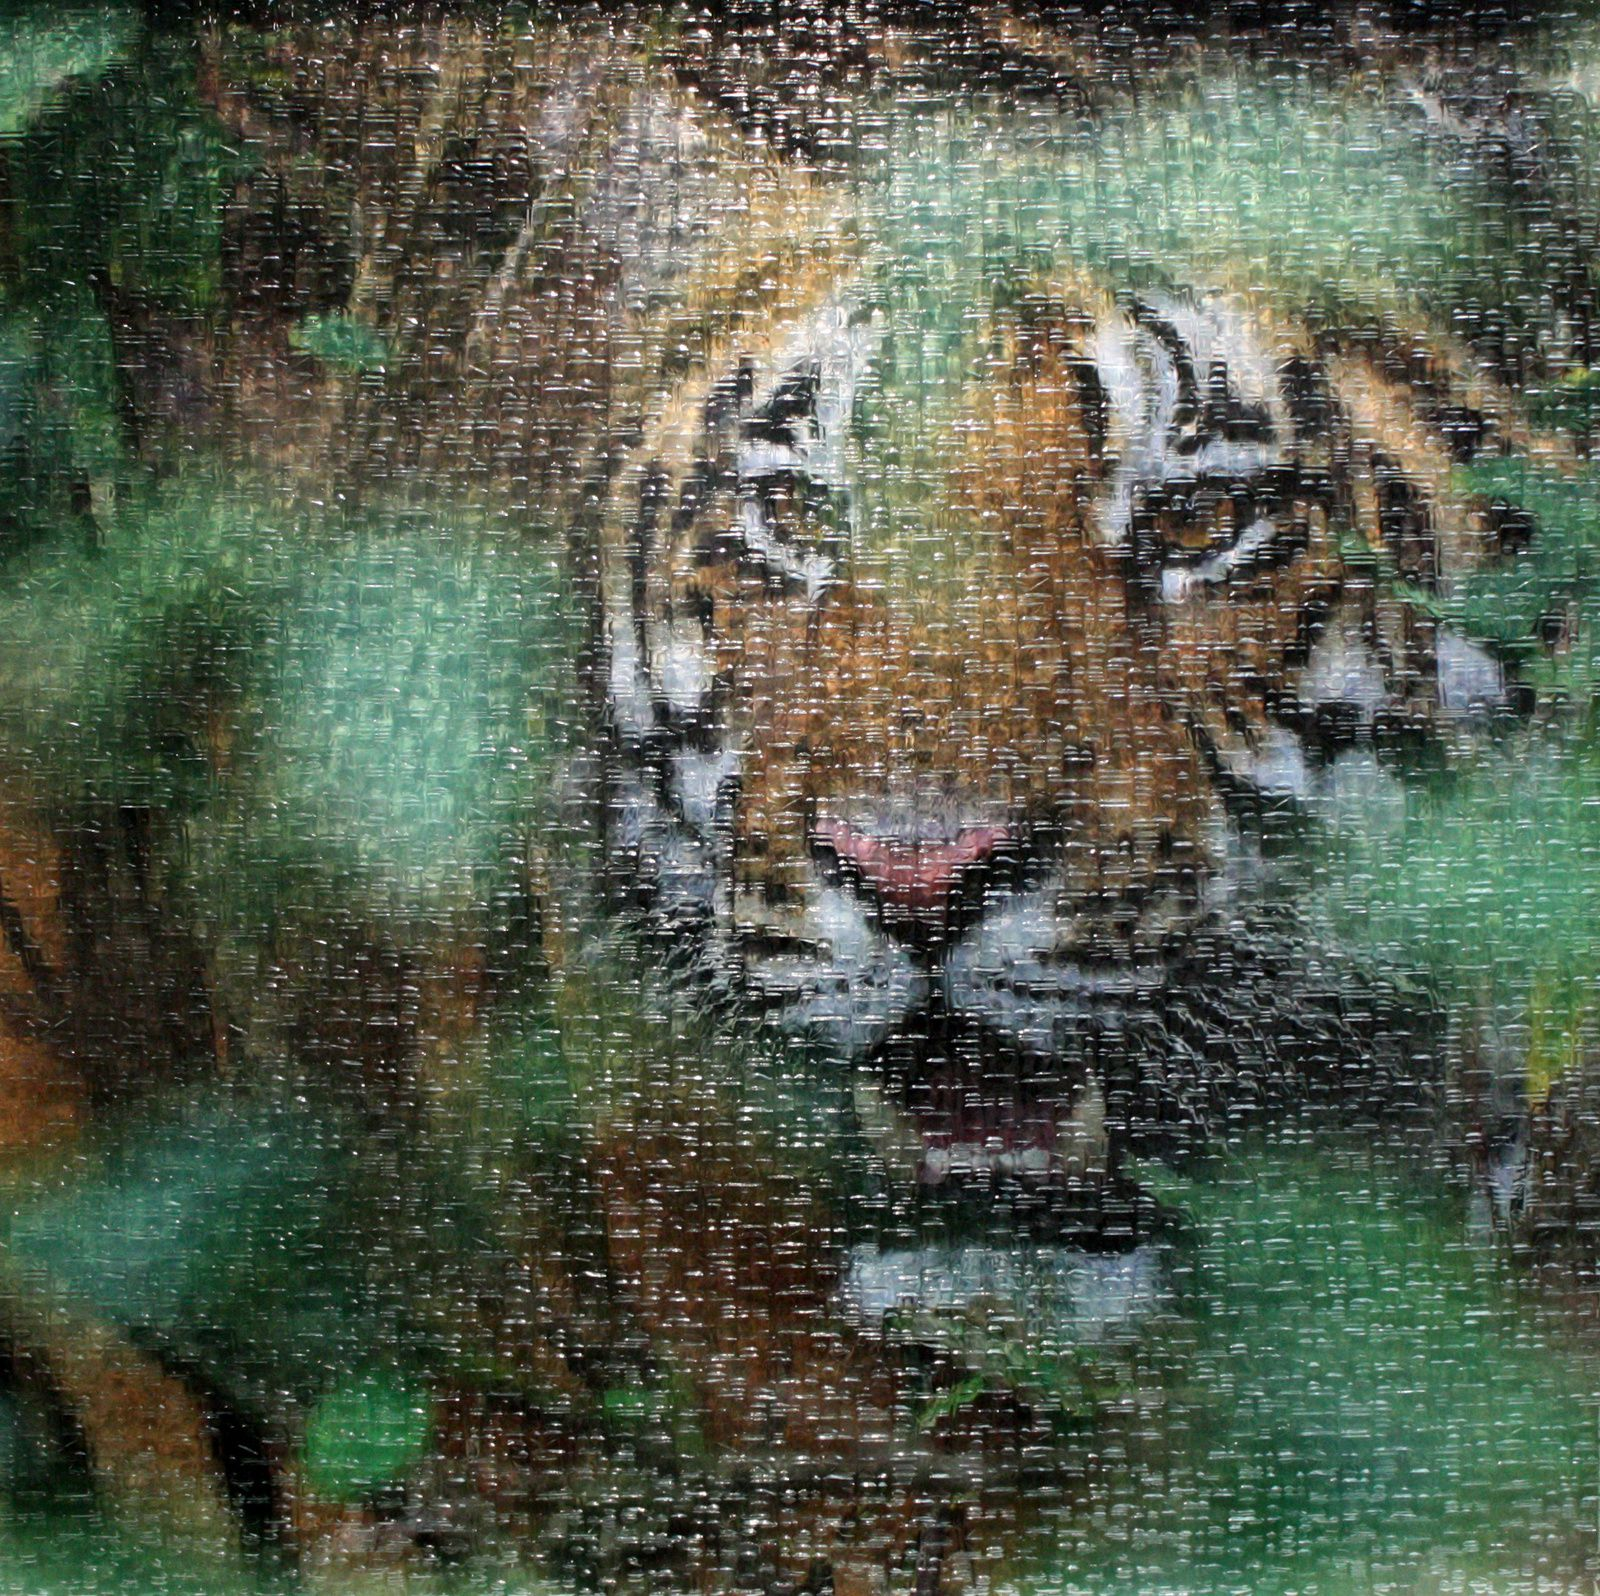 Thomas KNOLL (Tiger green Metallic + Abstracto), 2014